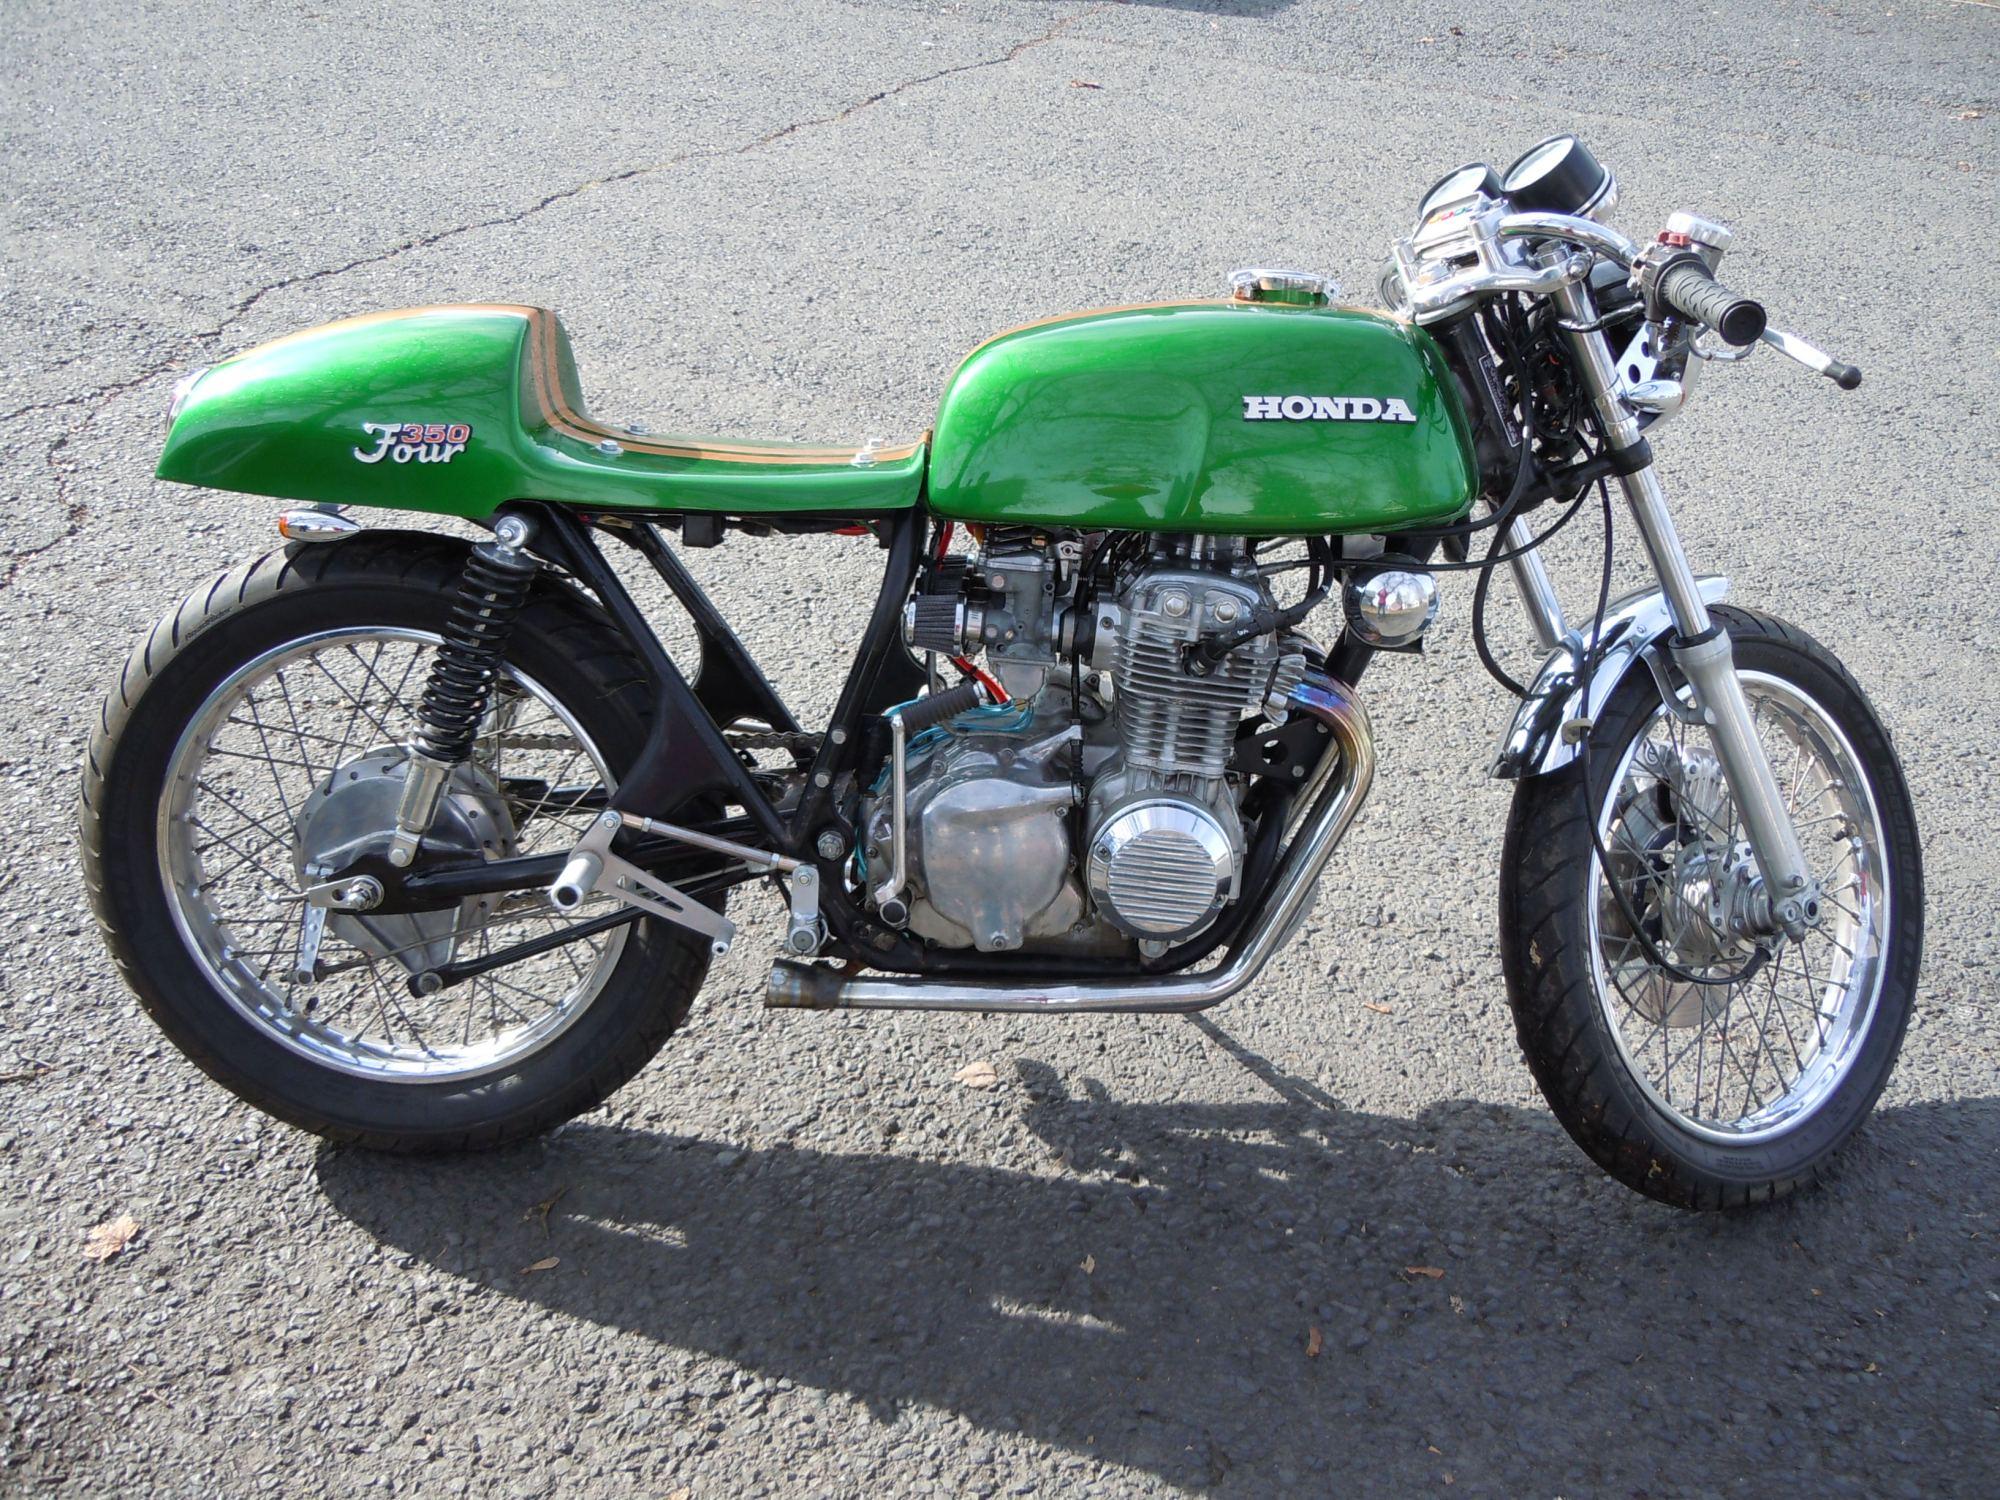 hight resolution of 1972 honda cb350f vintage cycle 1972 honda cb350 wiring headlights on 1972 honda cb350f motorcycle